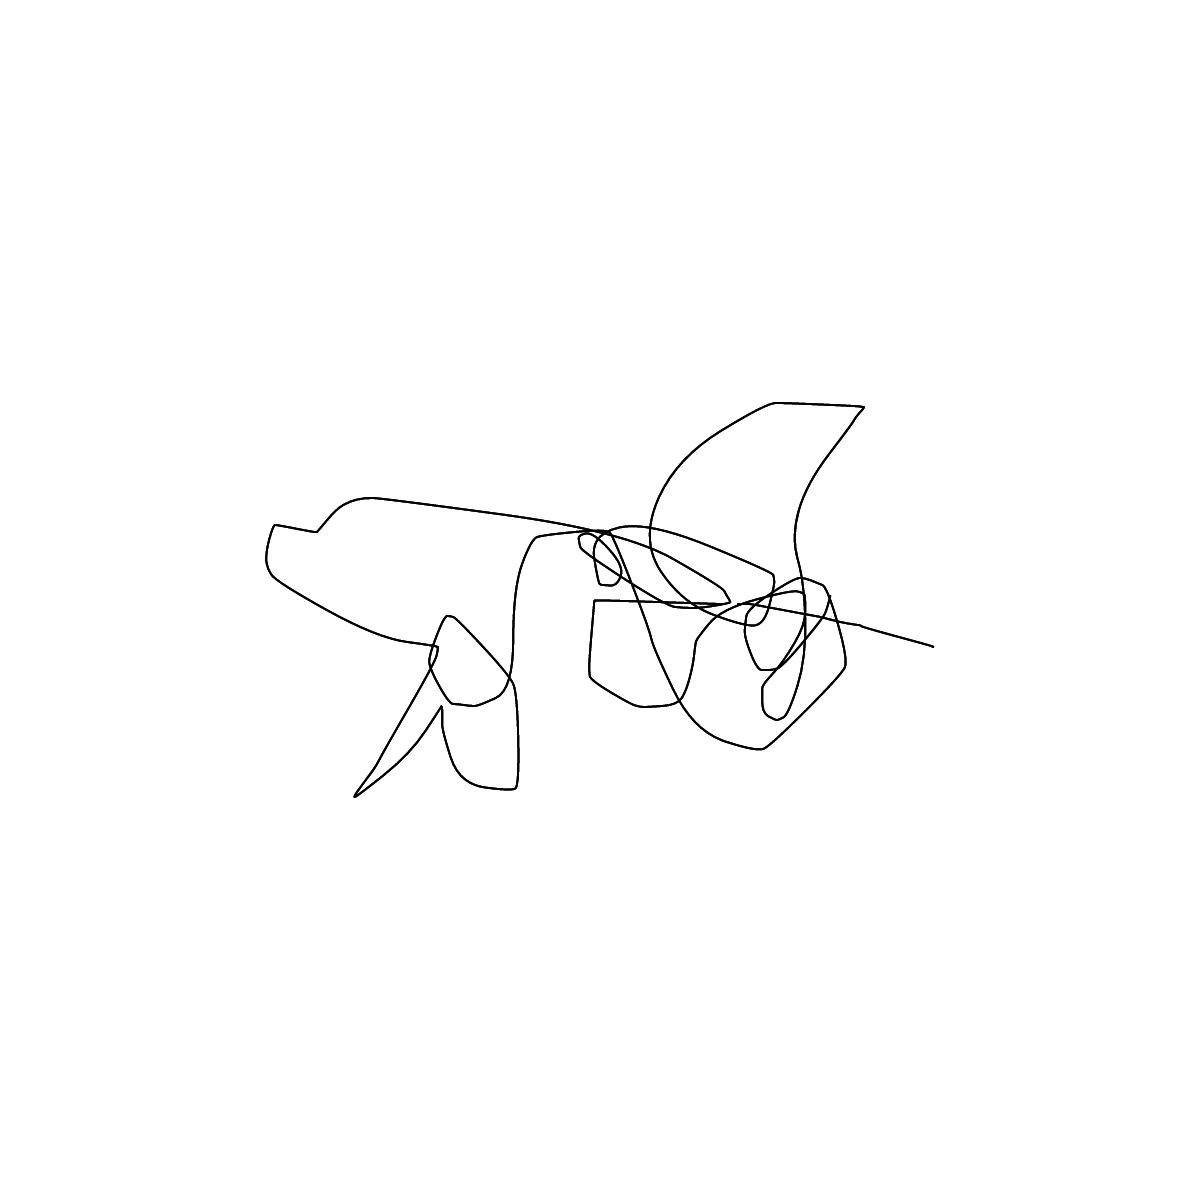 BAAAM drawing#2843 lat:17.4507961273193360lng: 78.5526046752929700